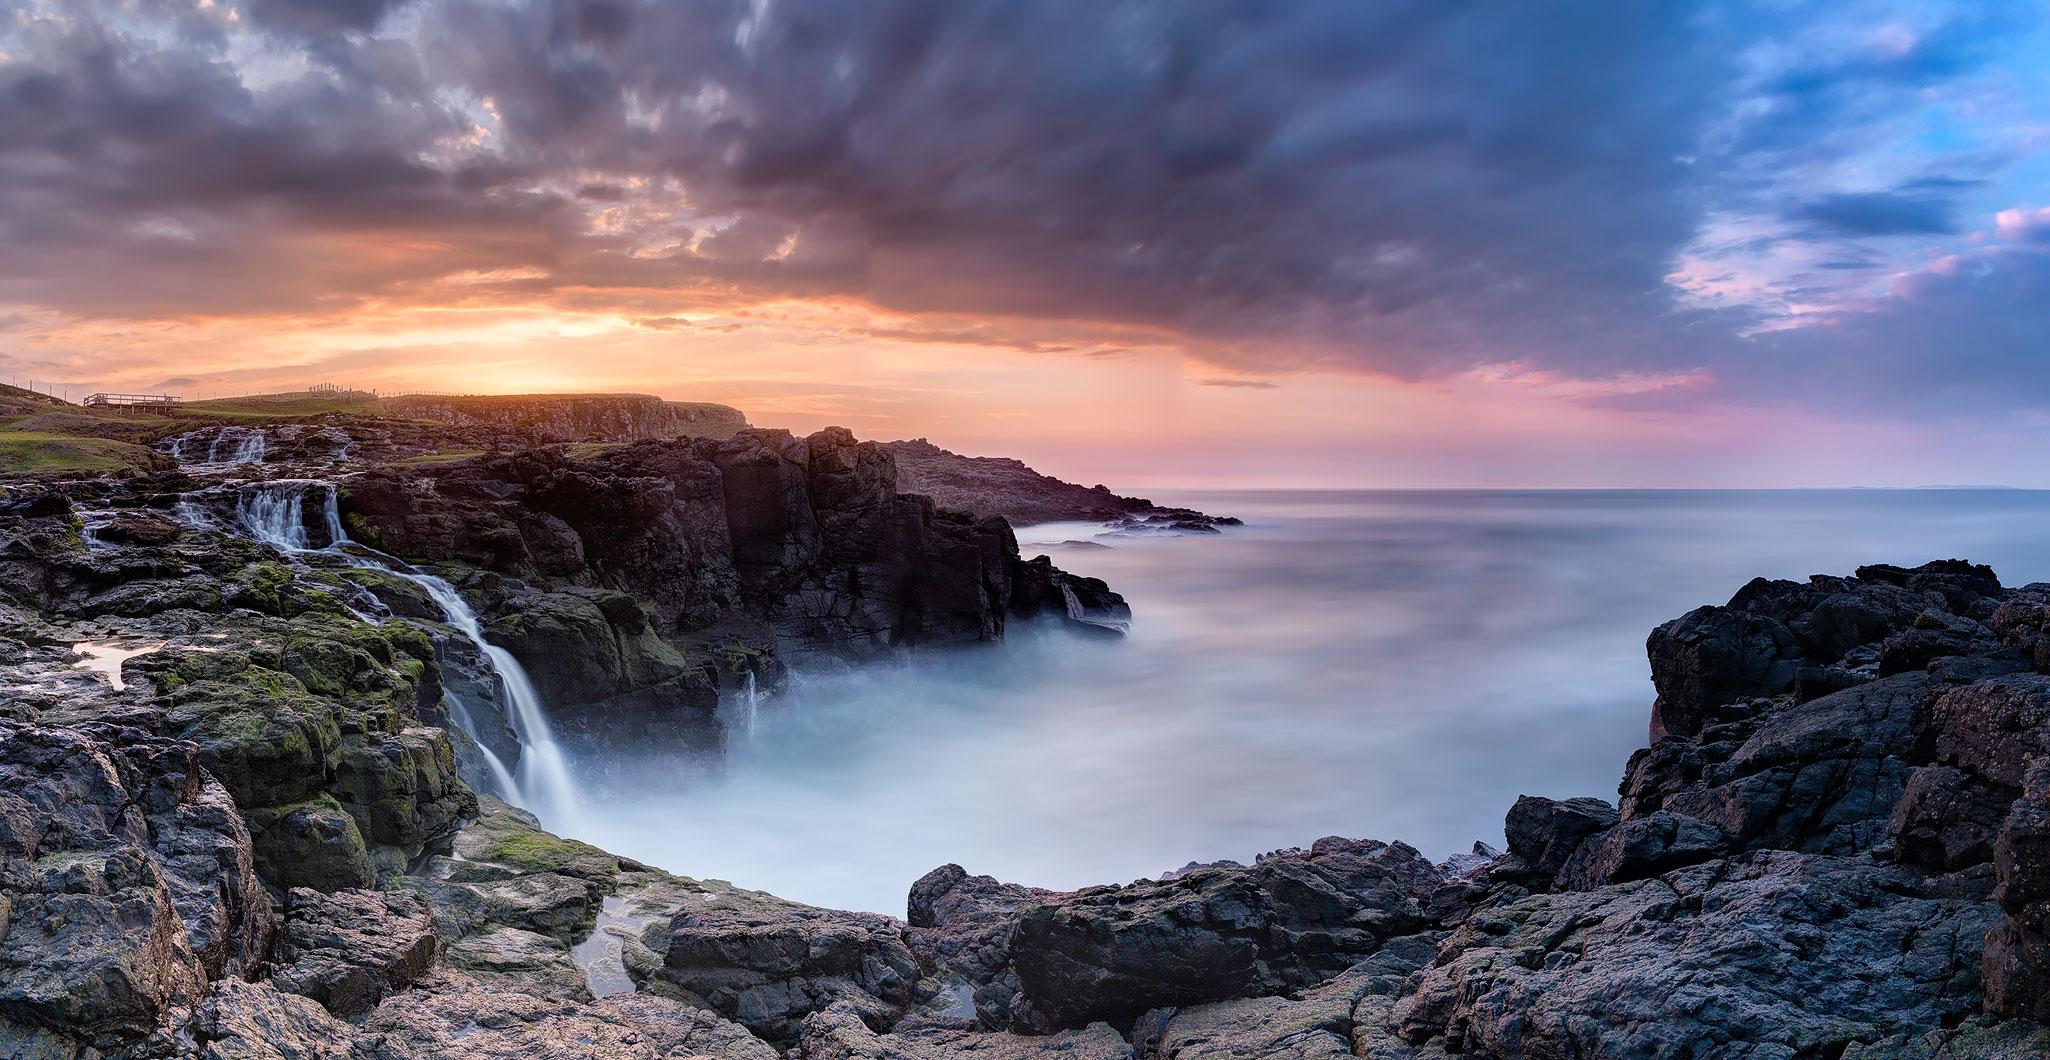 Dunsverick Waterfall County Antrim